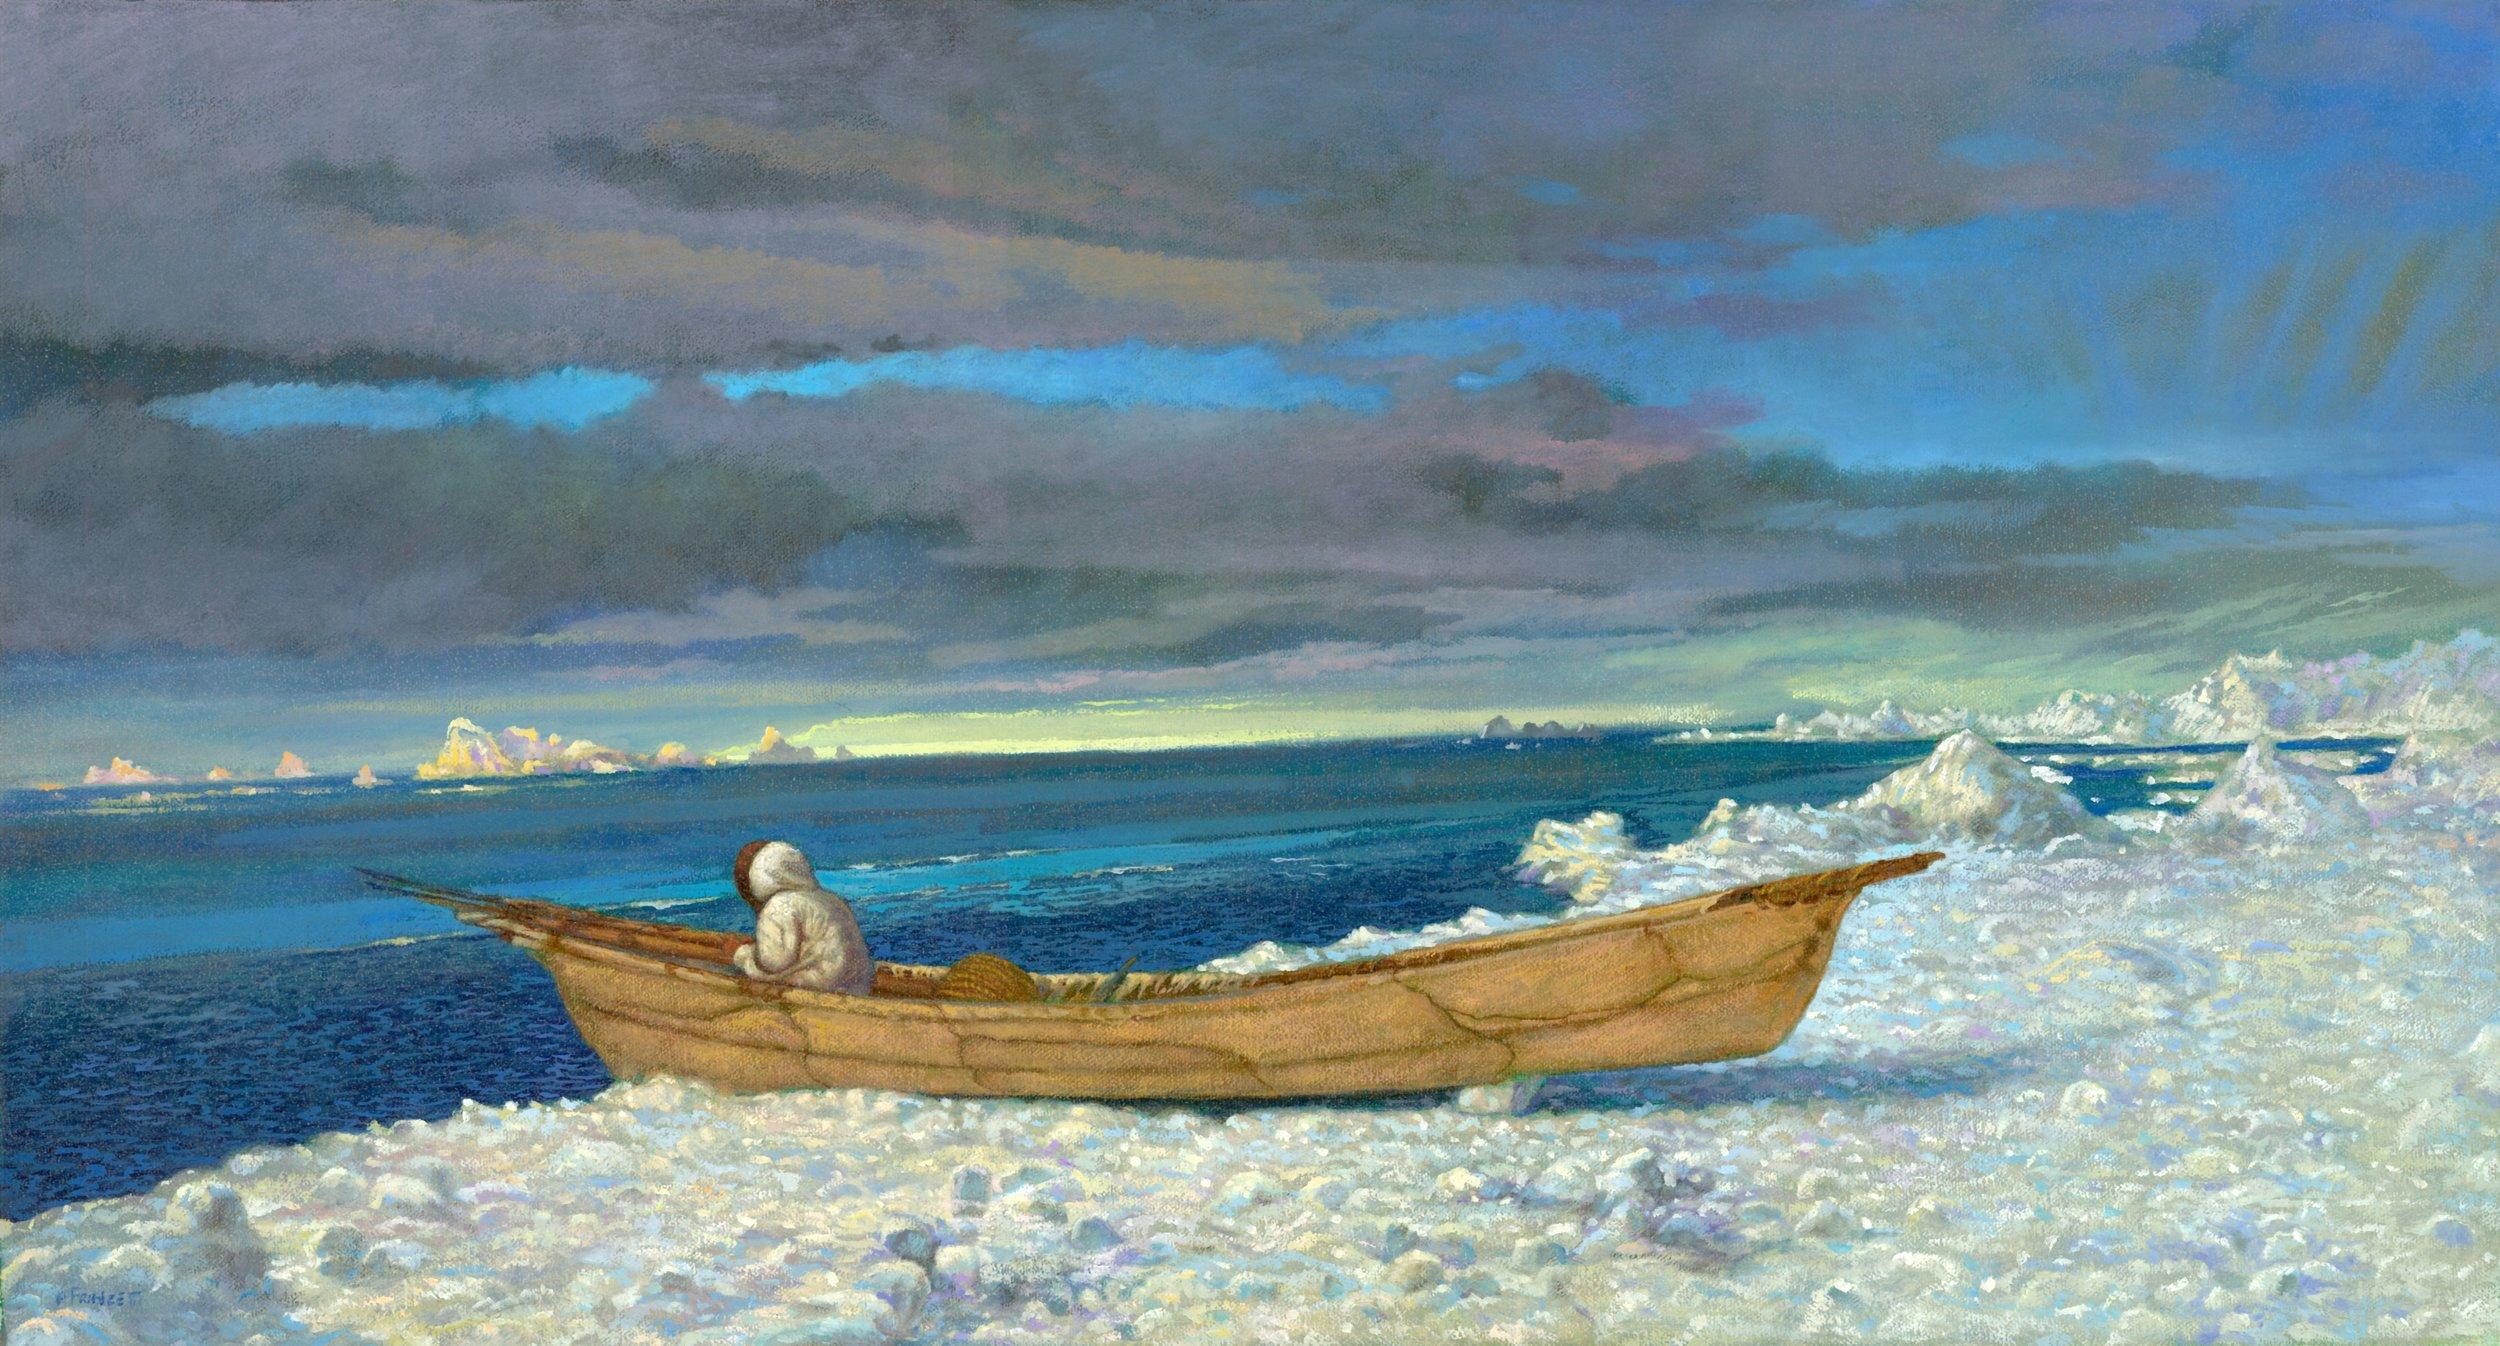 DECEMBER-InuitEskimoBarrowAlaska.jpg